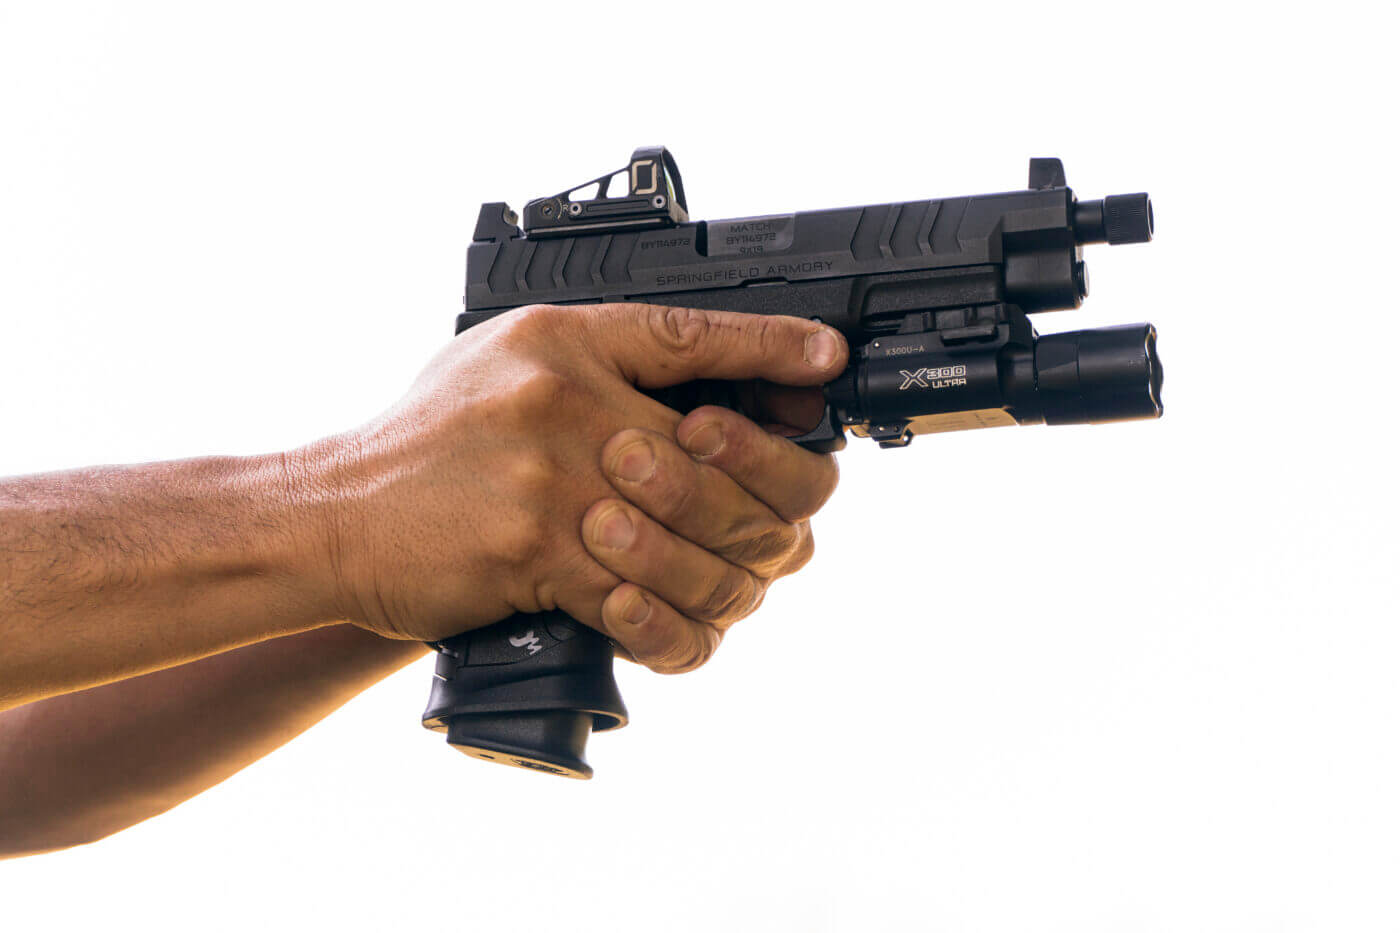 Surefire X300U-A on Springfield Armory pistol